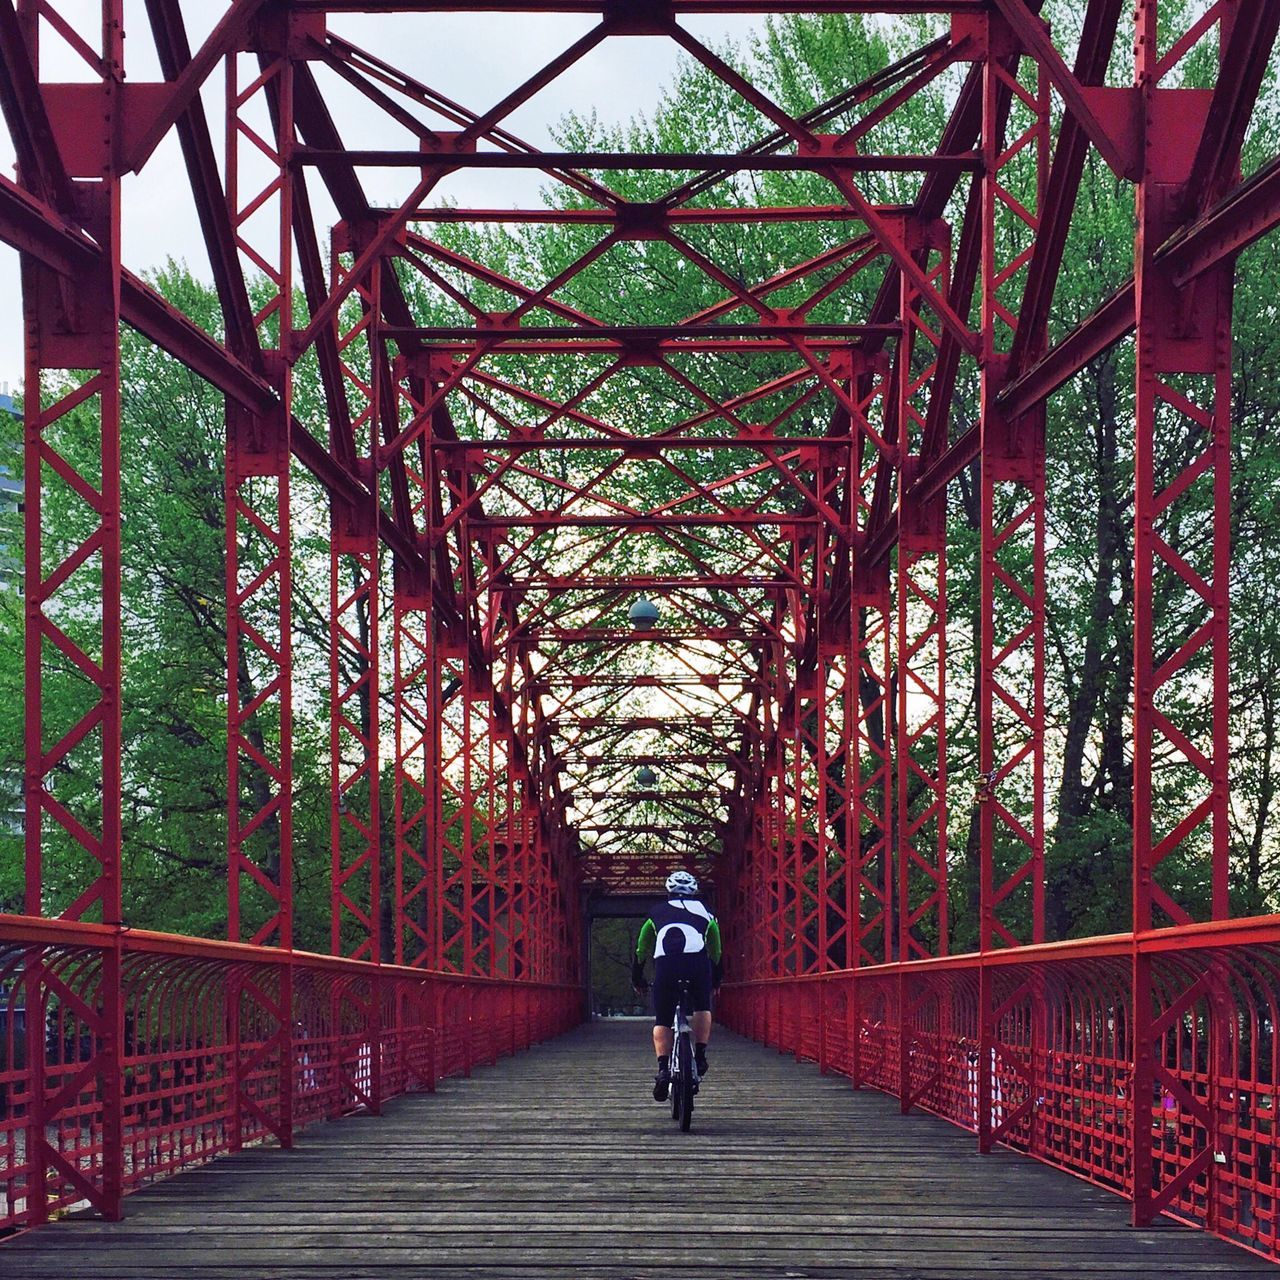 Rear View Of A Man Bicycling On Bridge